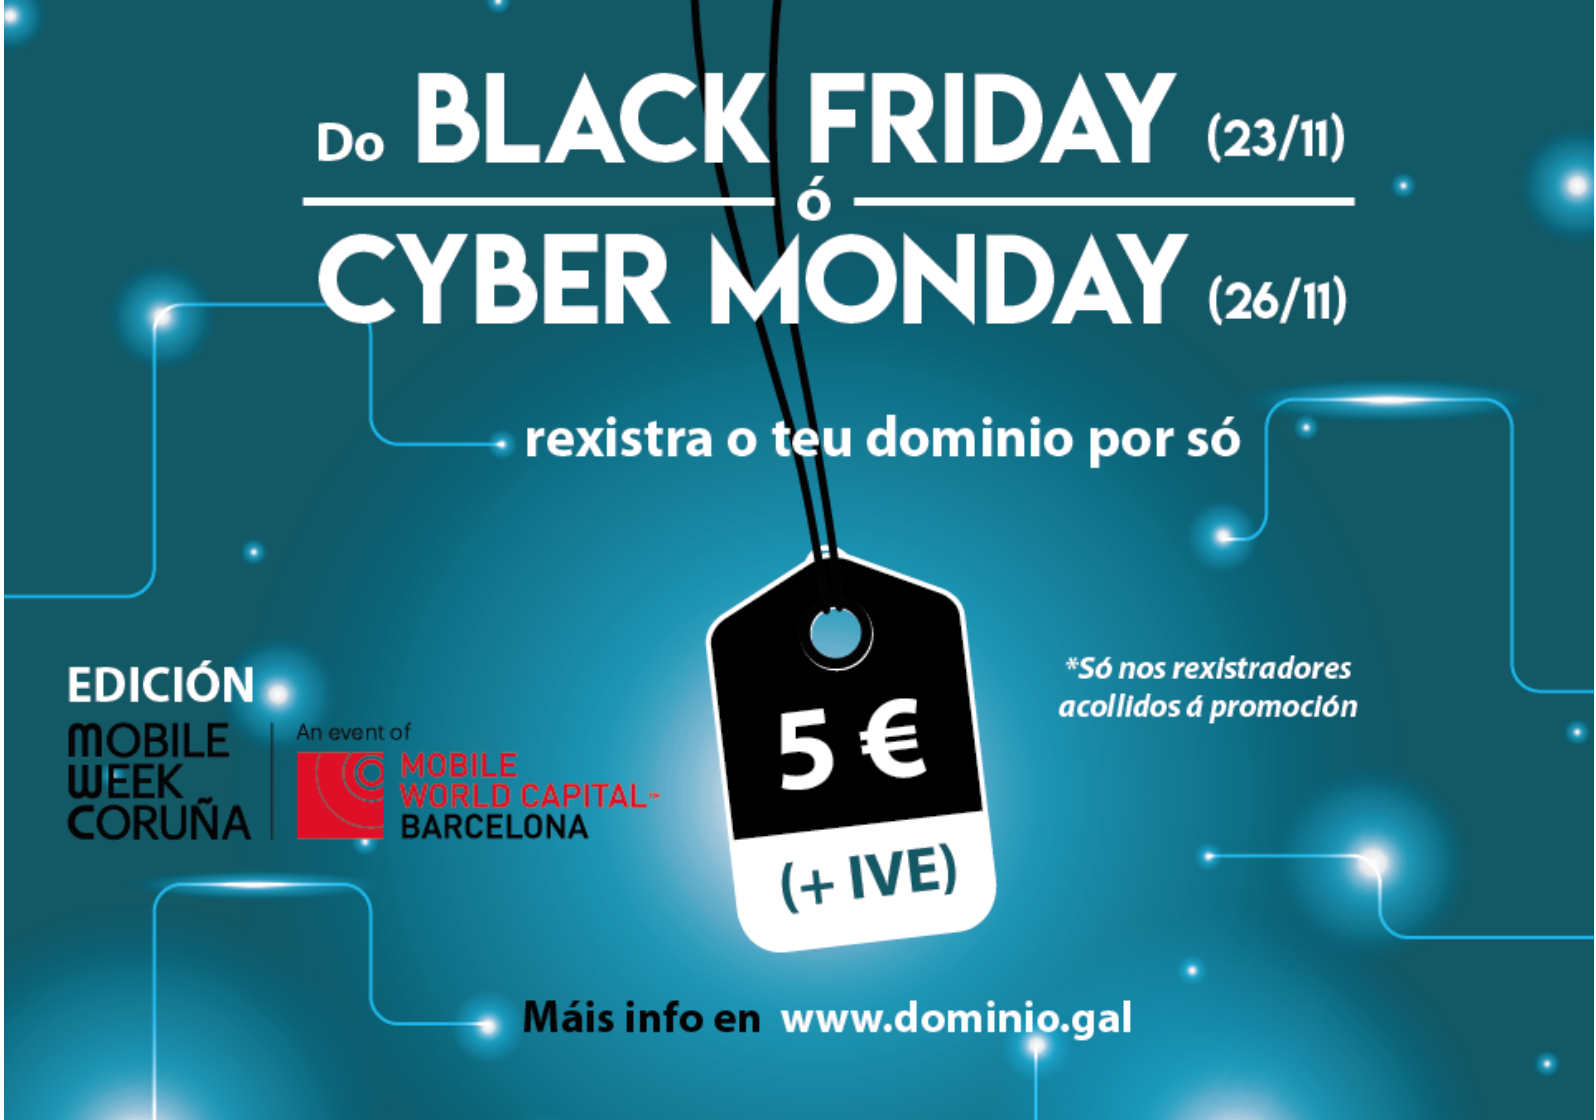 Black Friday ao Cyber Monday